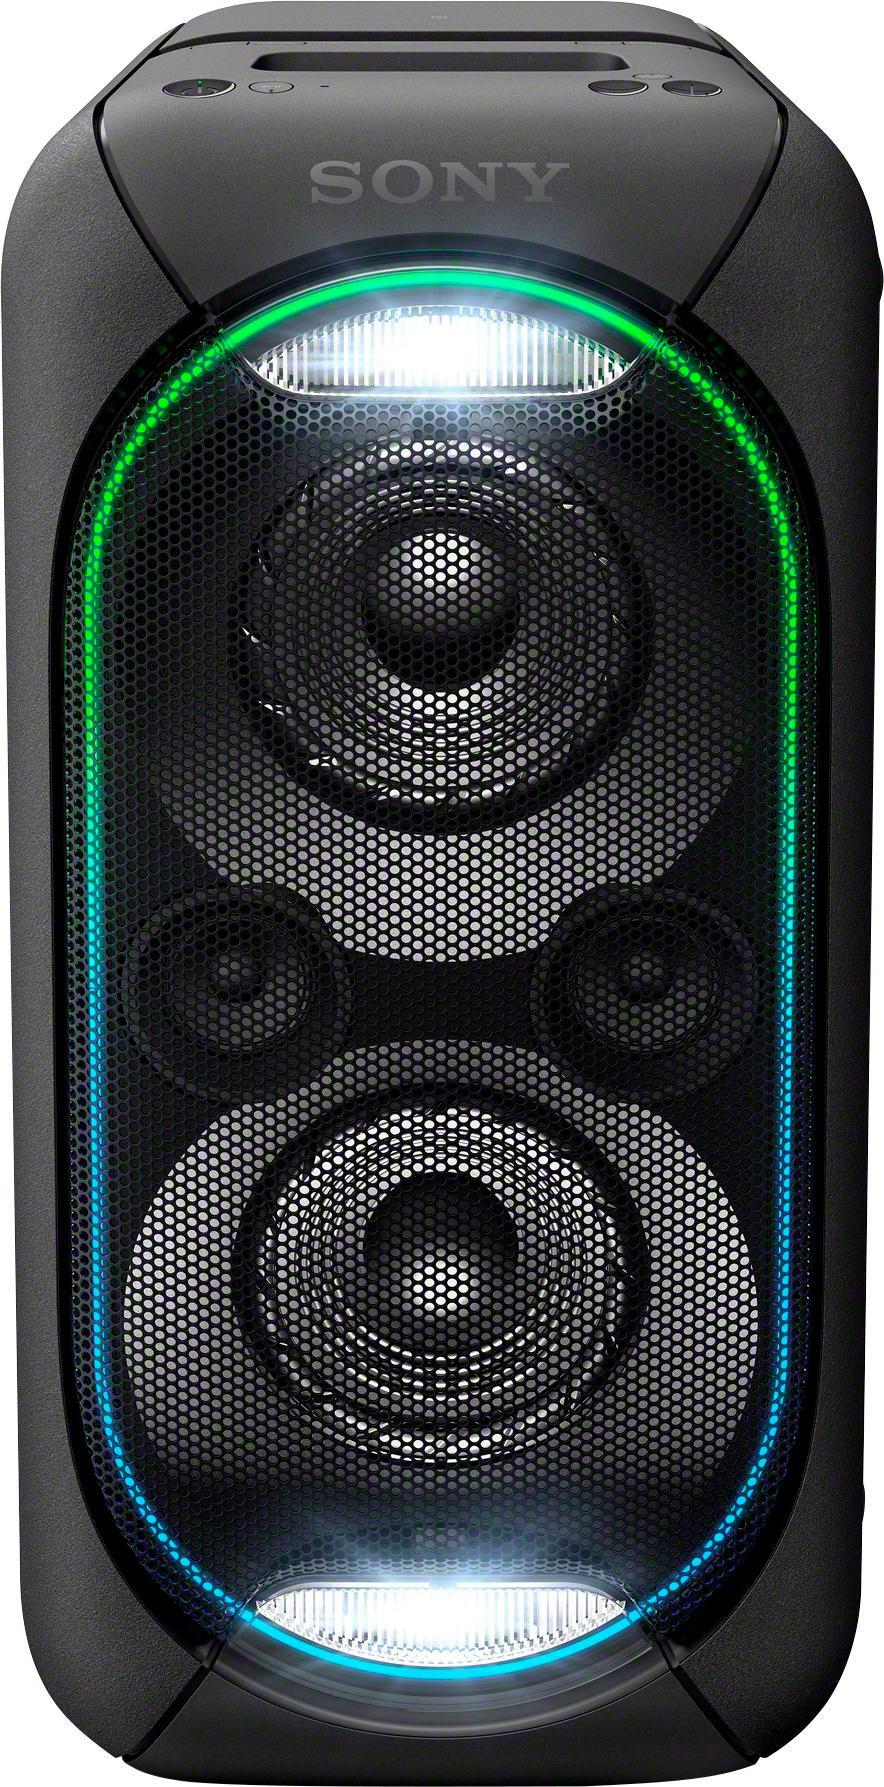 Sony - High Power XB60 Portable Bluetooth Speaker - Black - Larger Front b822d436750ca